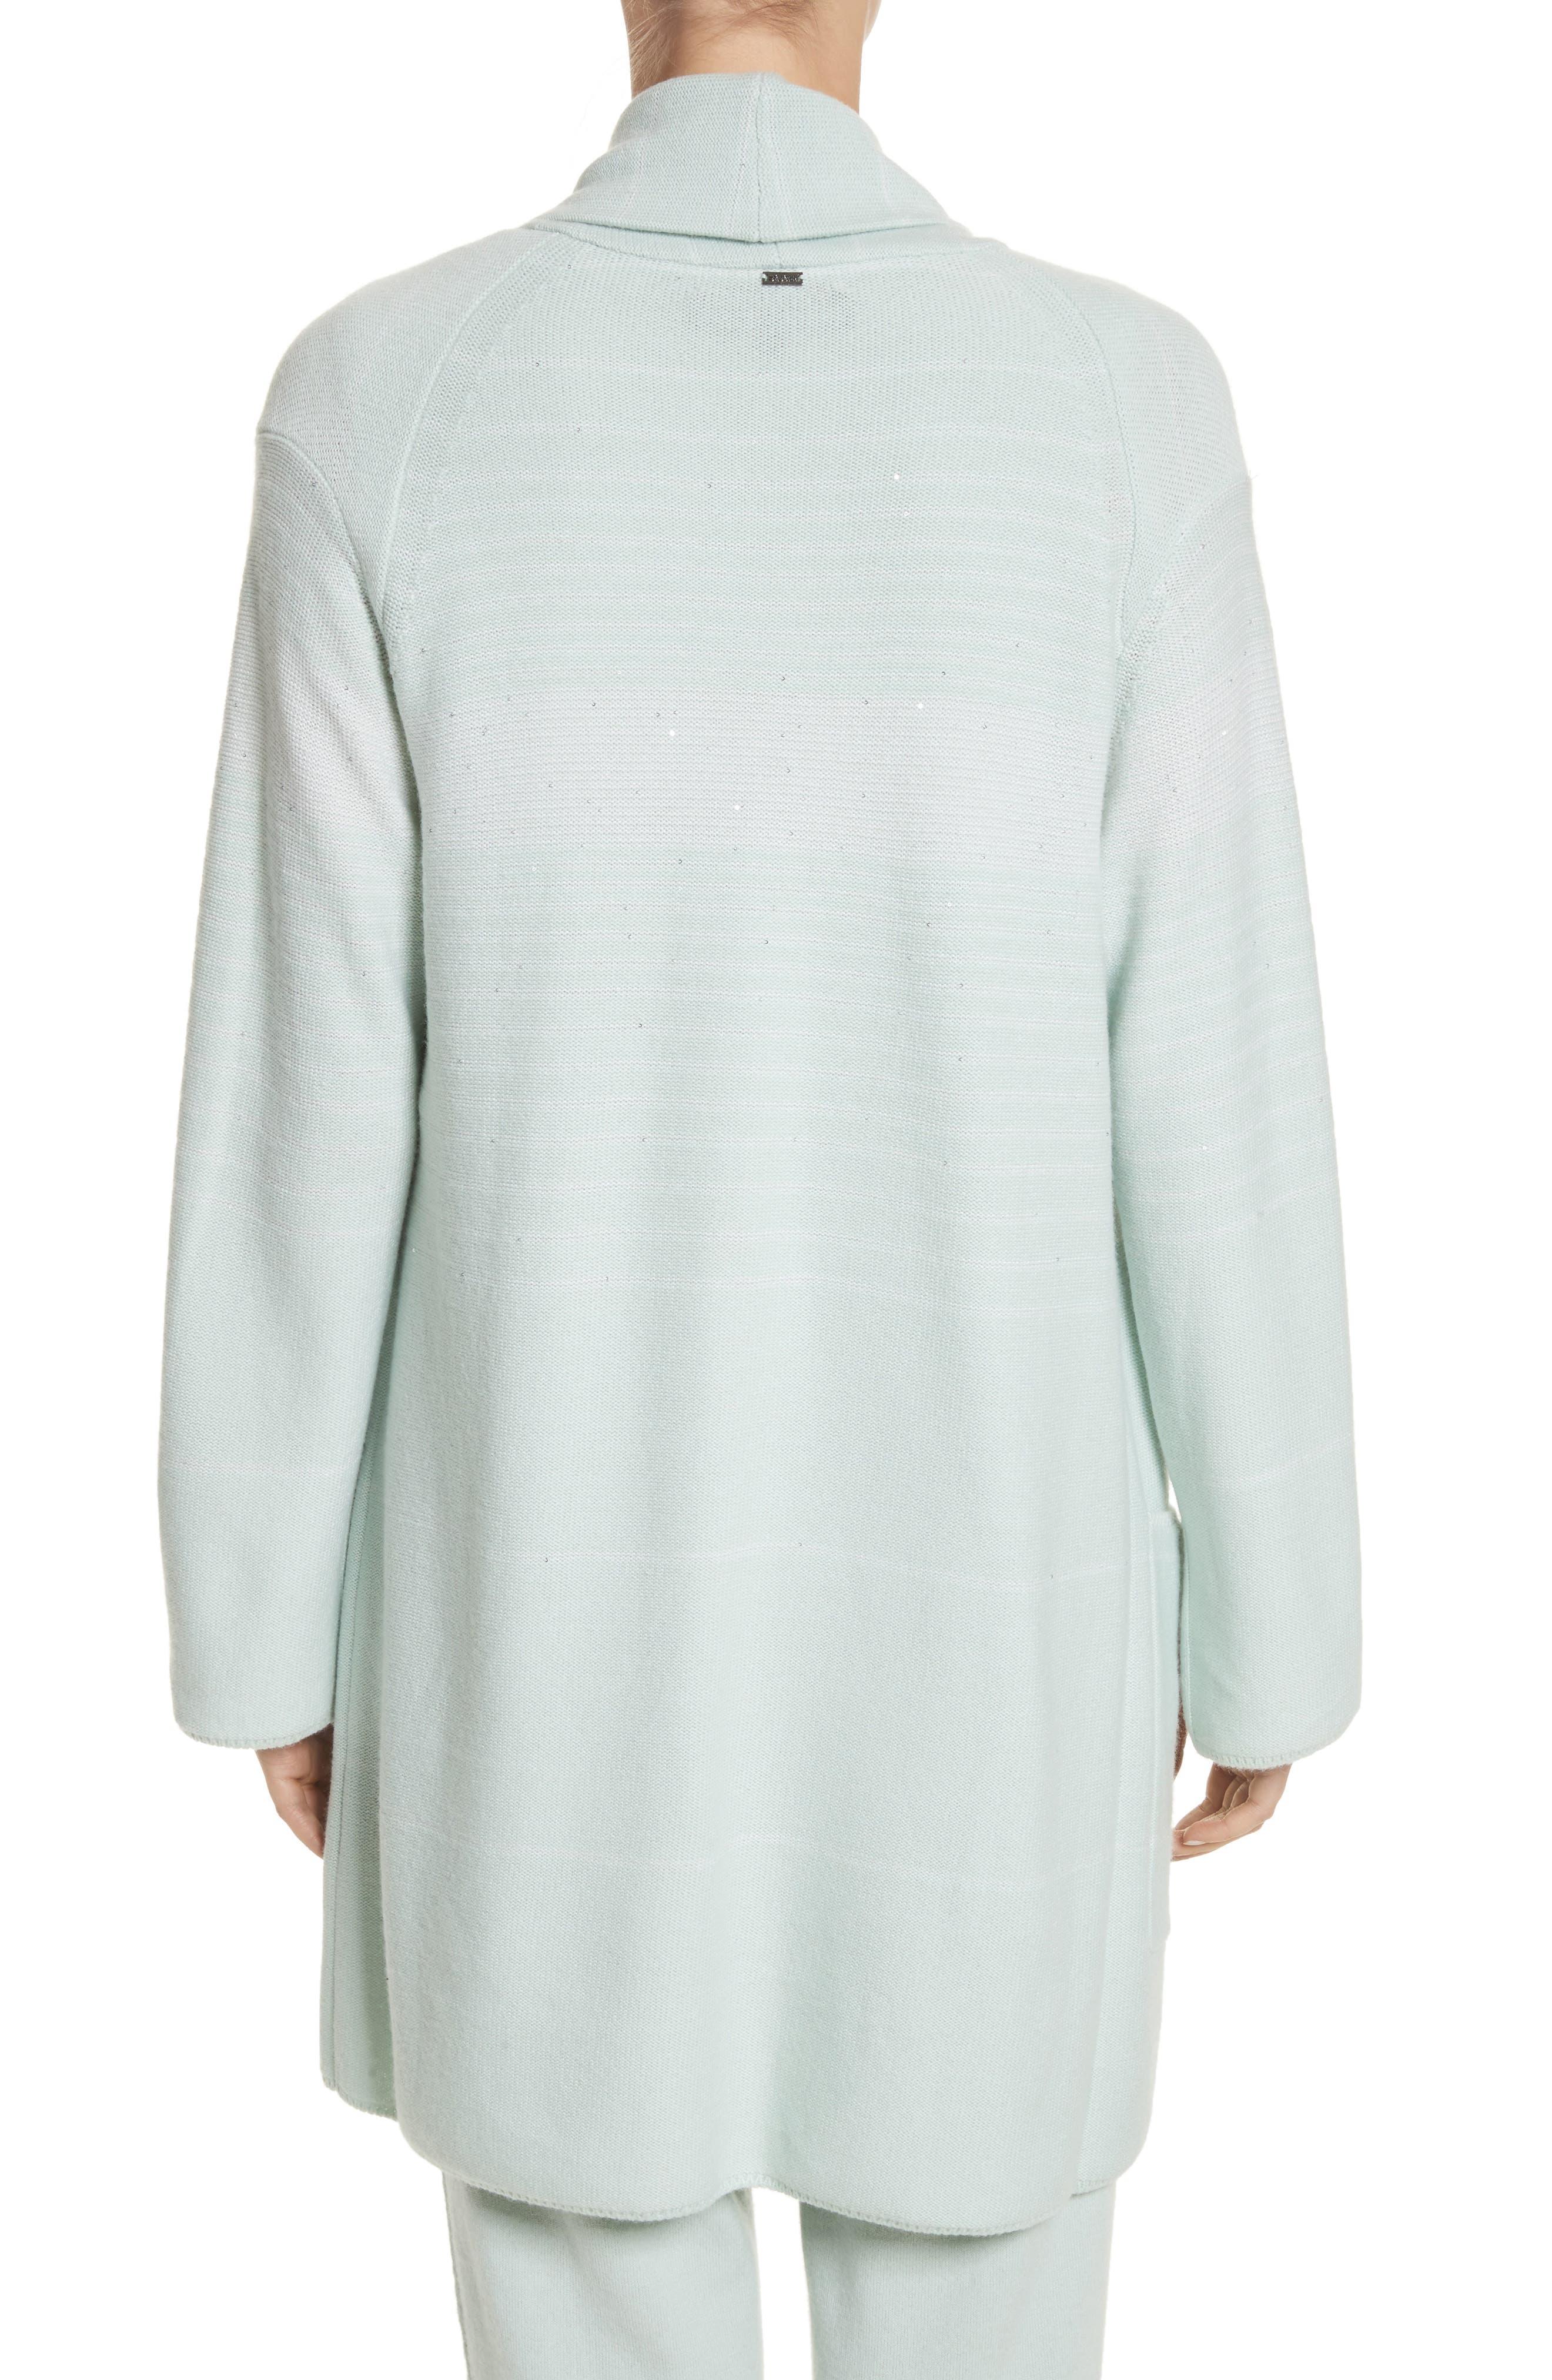 Sequin Cashmere & Silk Cardigan,                             Alternate thumbnail 2, color,                             Mint/ Cream